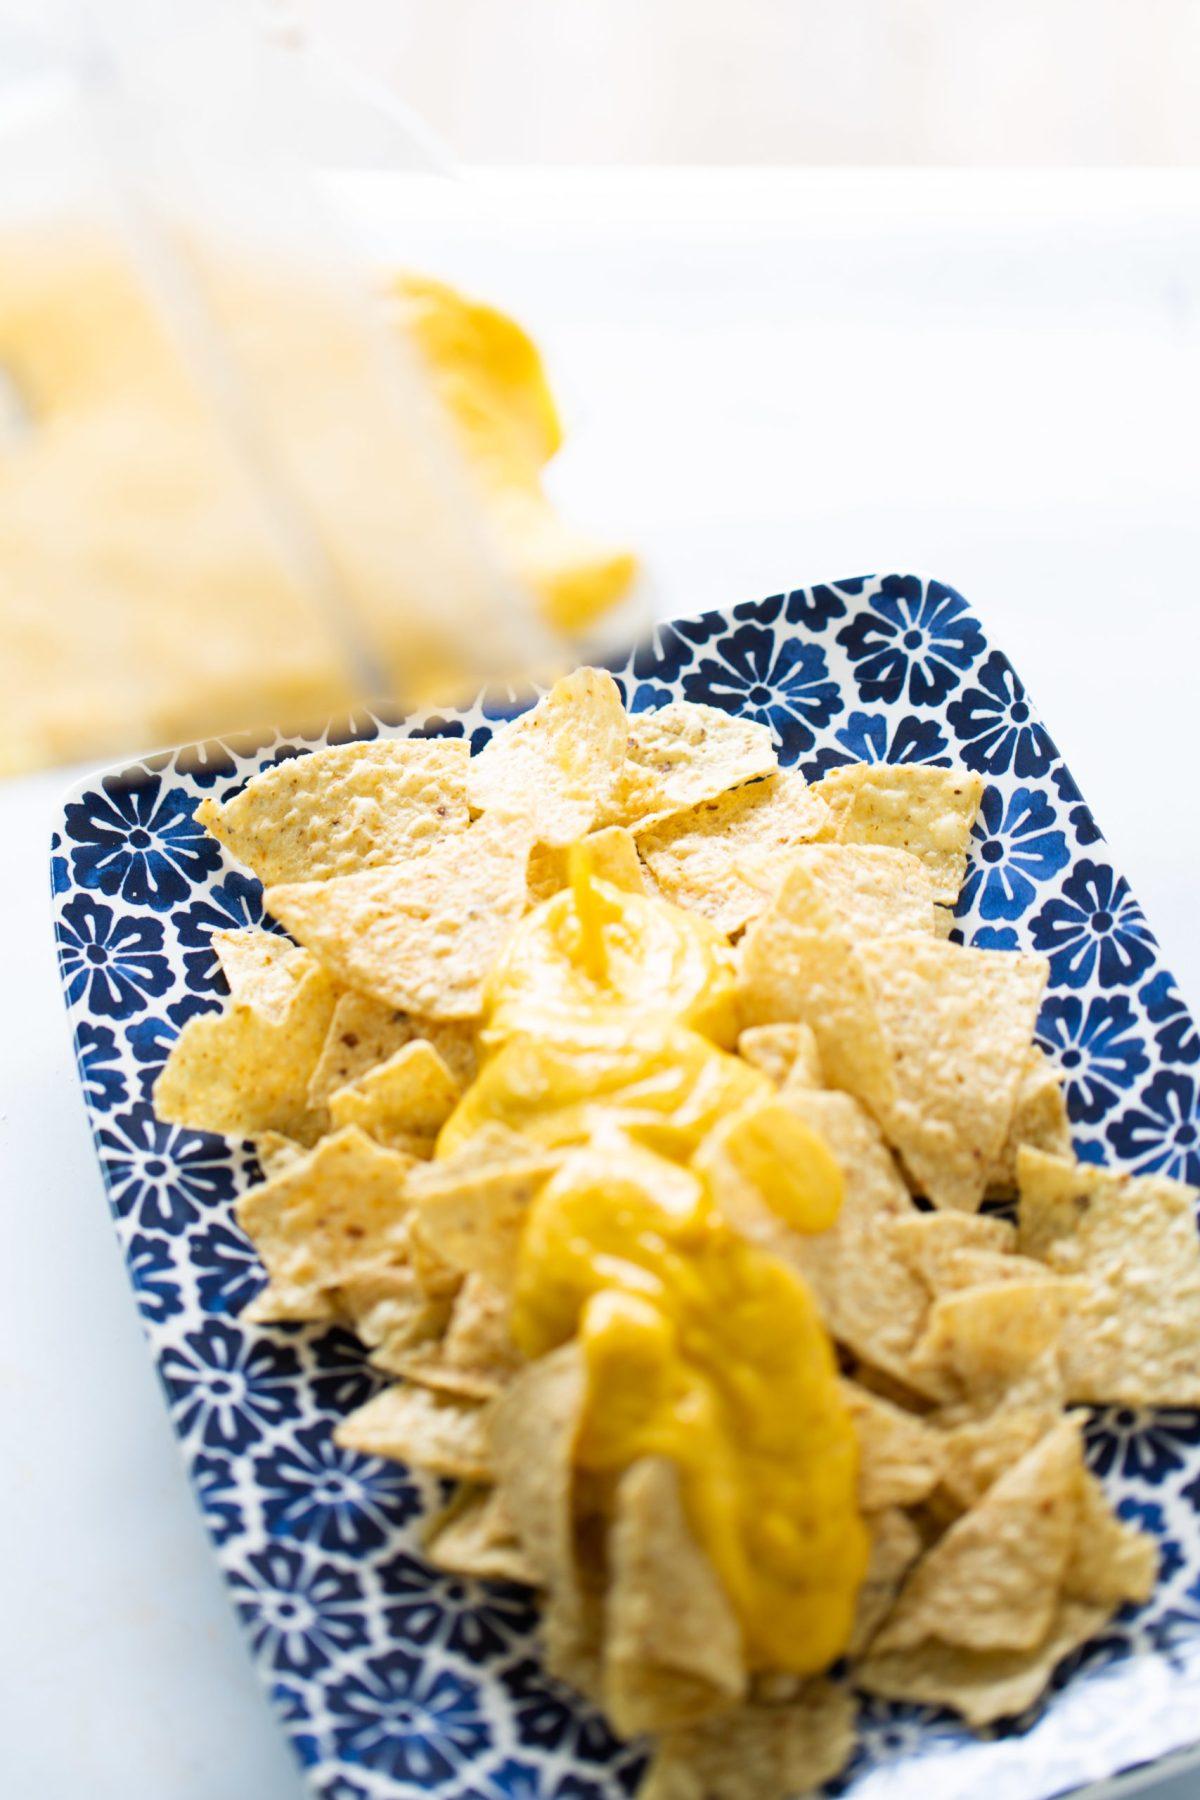 Pouring vegan queso ontop of nachos